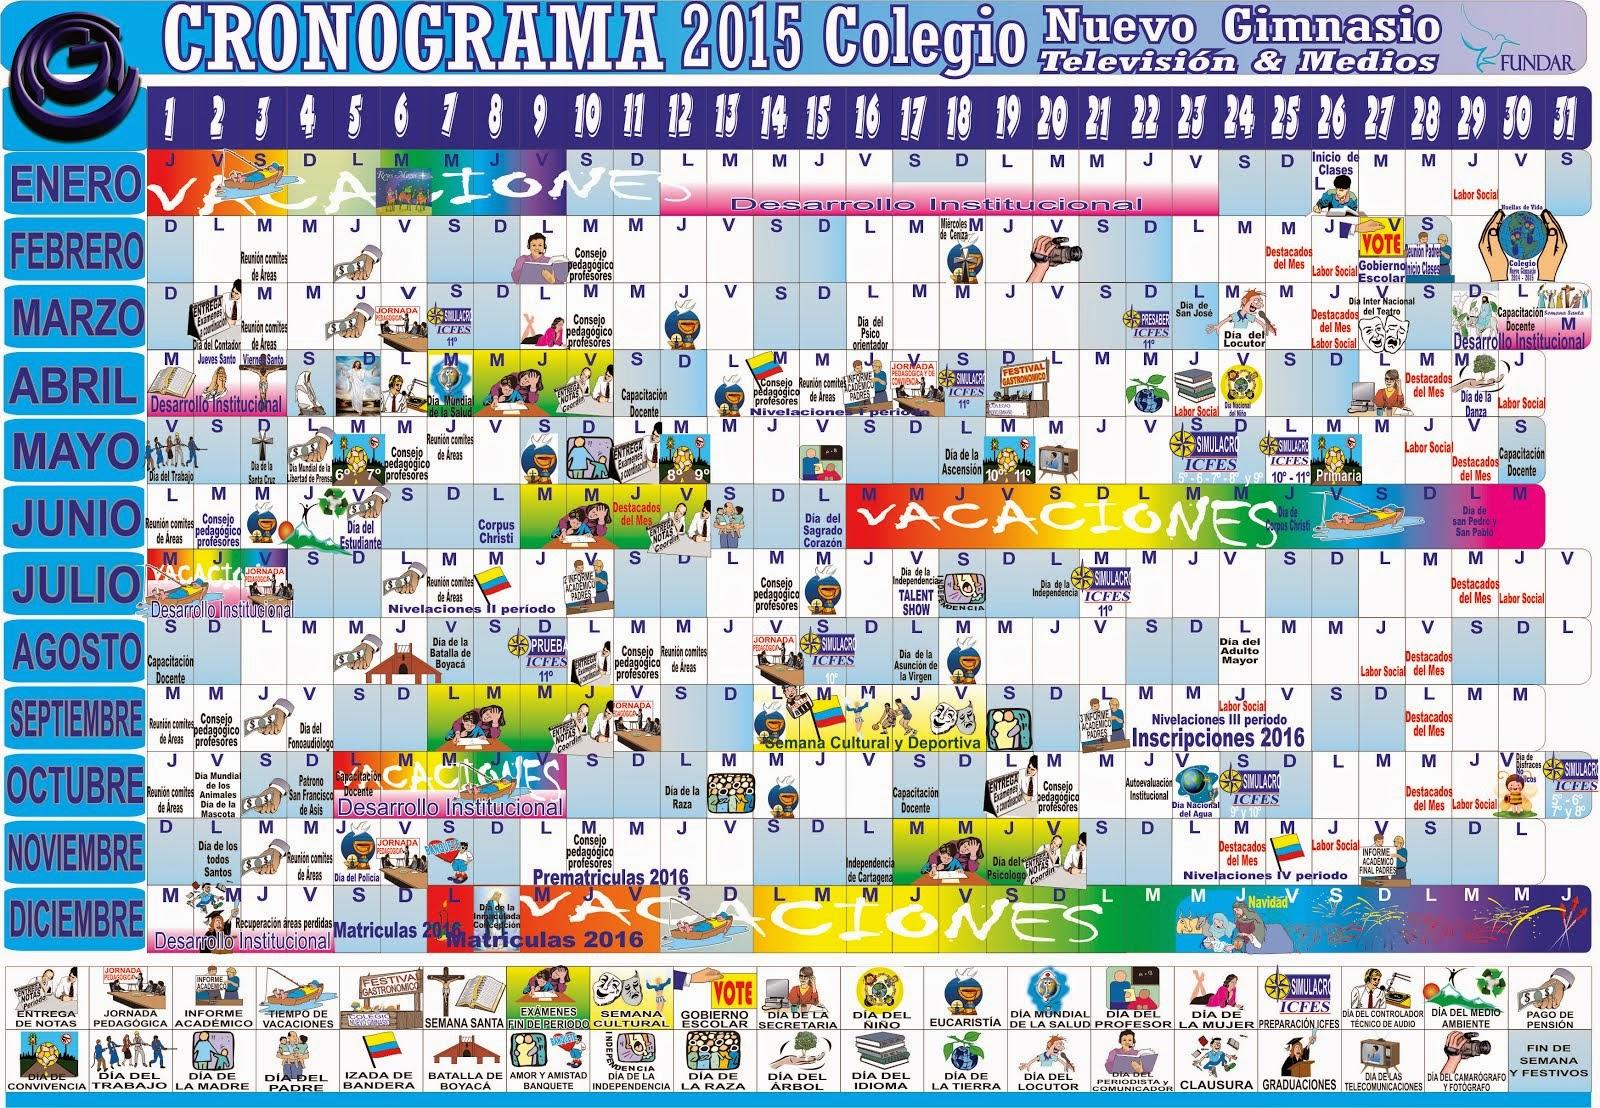 CRONOGRAMA 2015